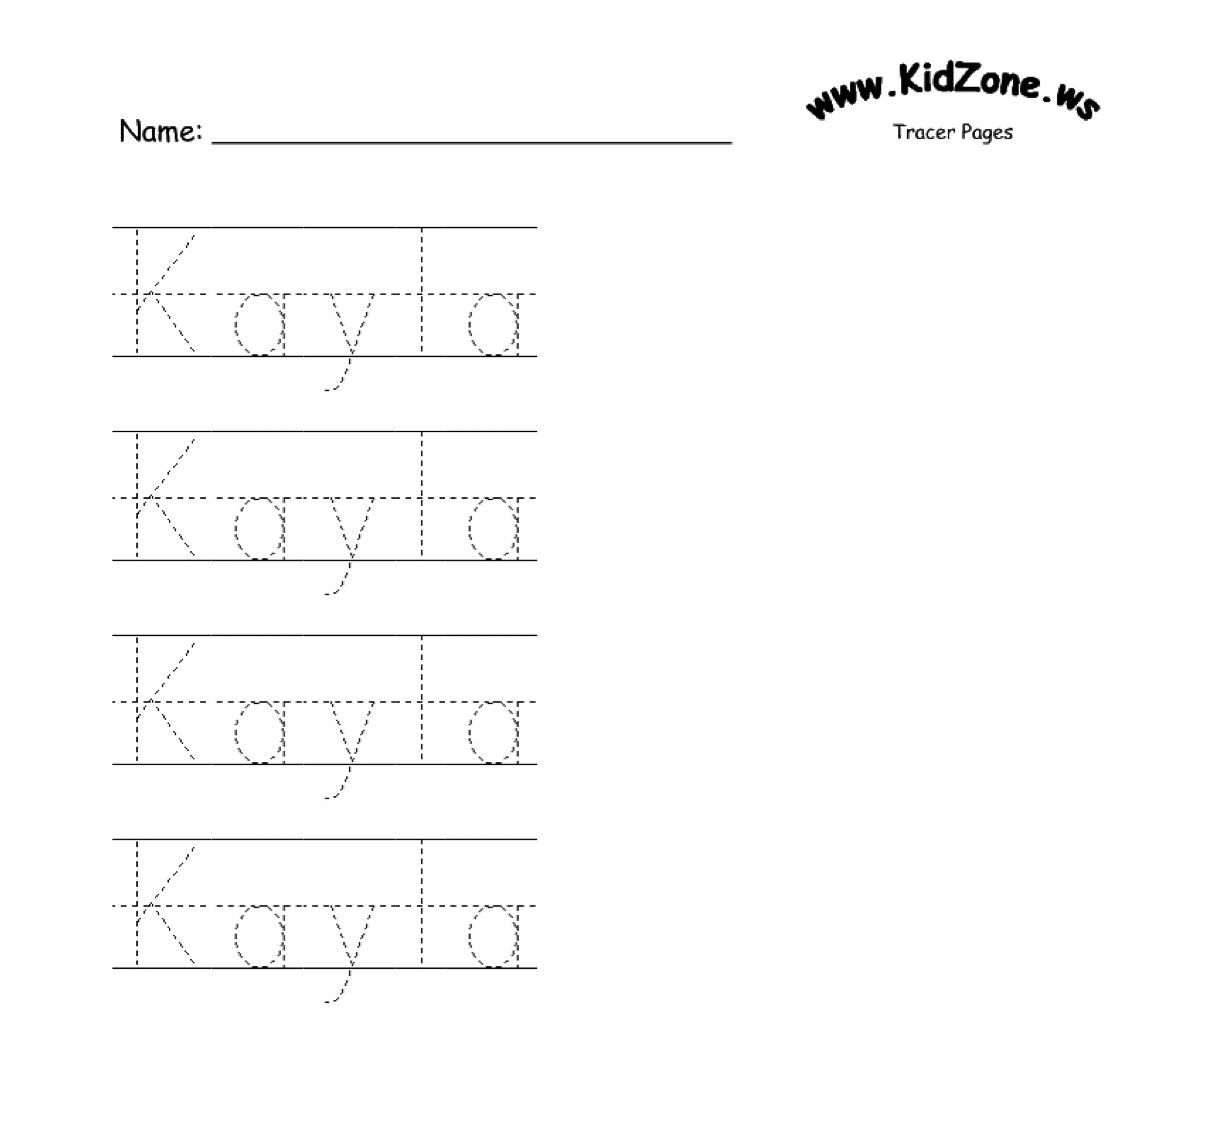 Custom Name Tracer Pages | Preschool Writing, Preschool